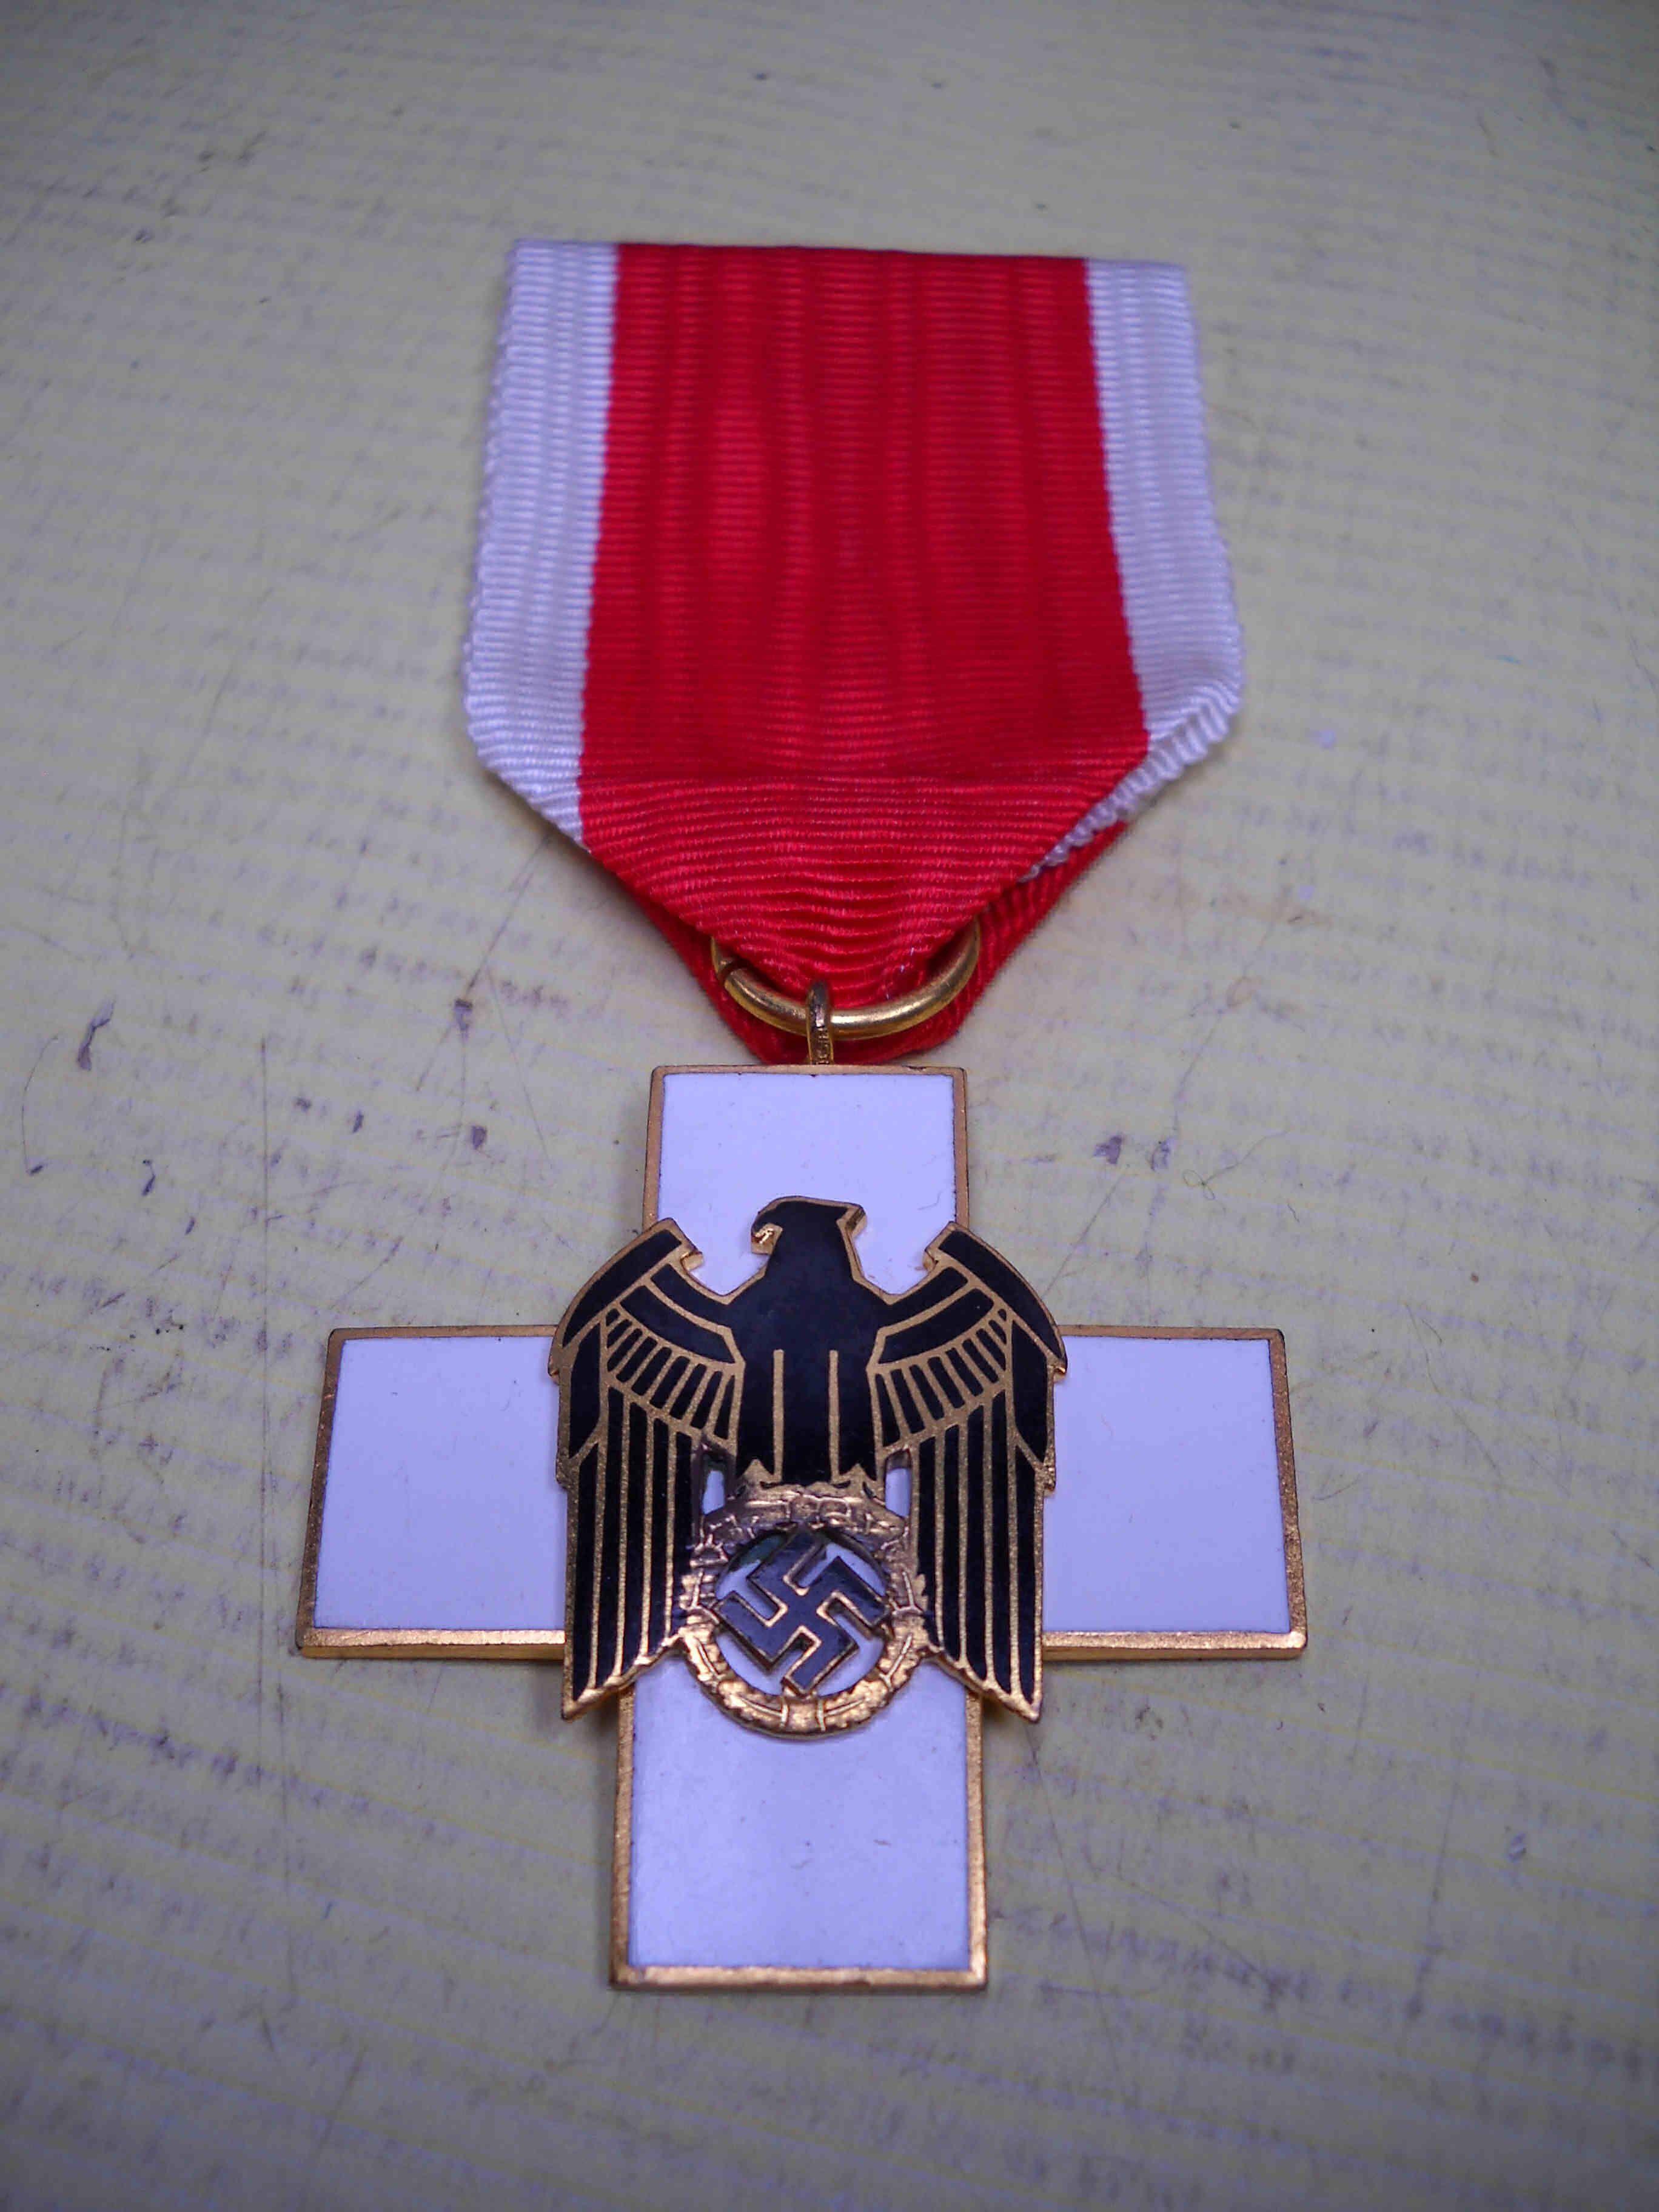 German world war ii enamel red cross drk medal with ribbon german deutschen rotes kreuzes drk - German military decorations ww2 ...